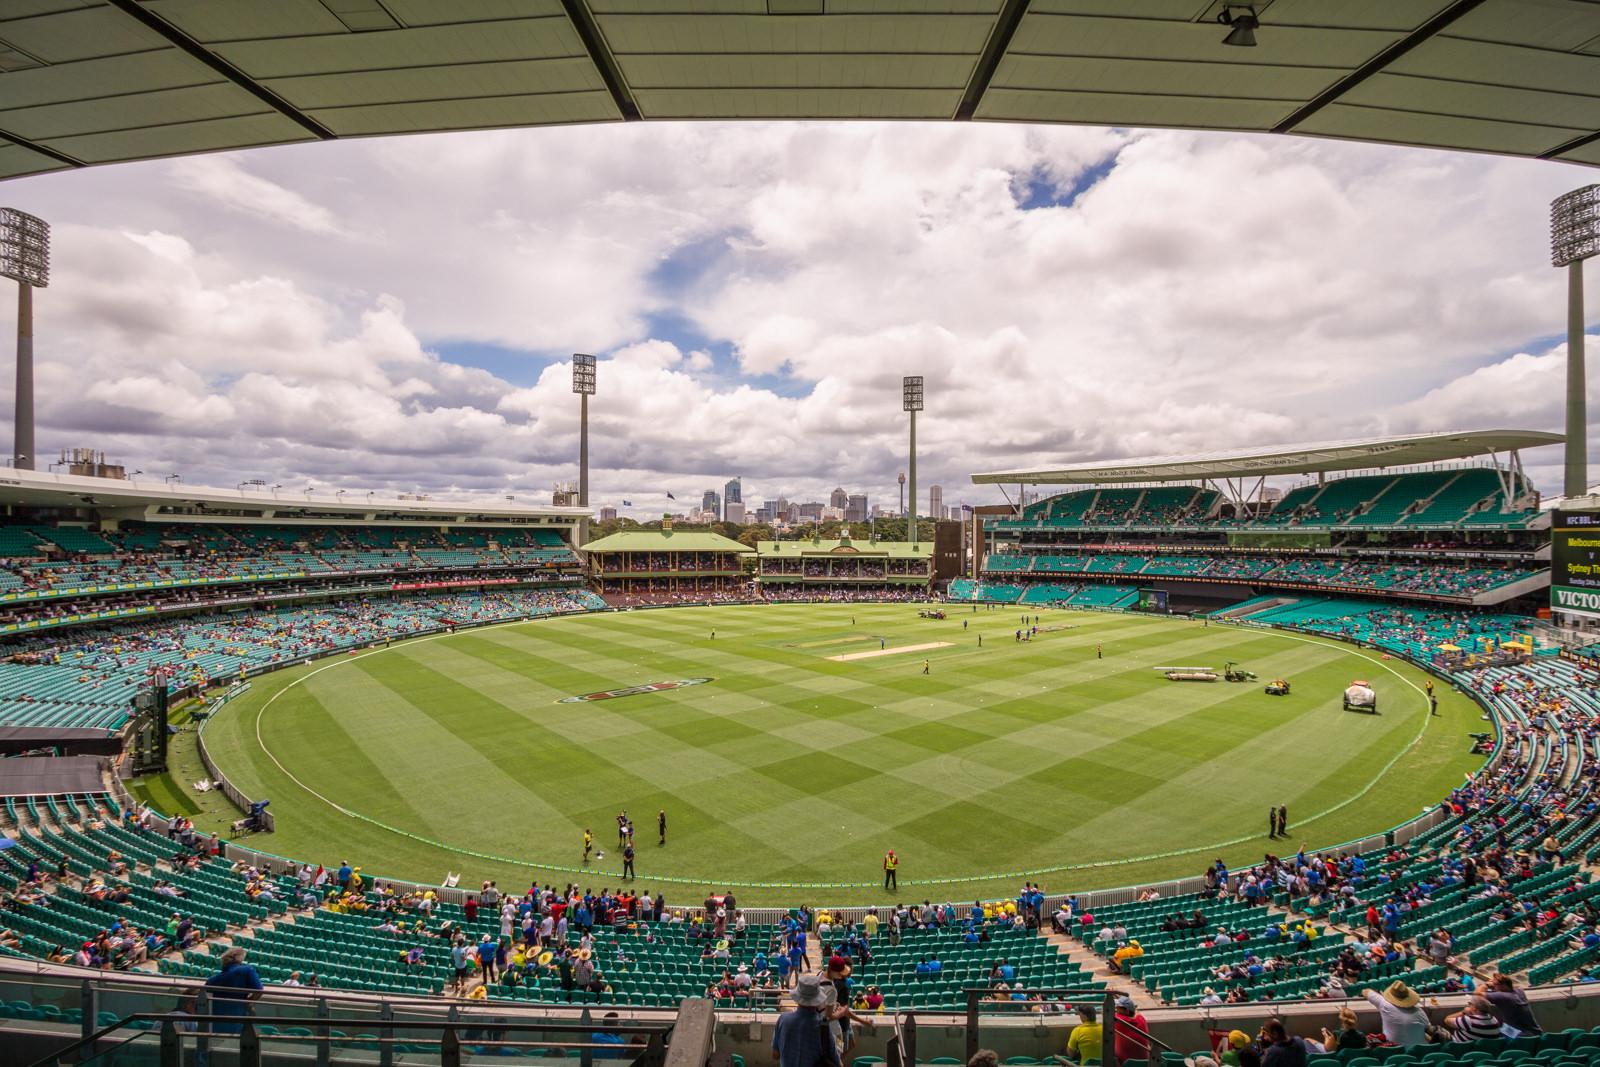 Teas test dates in Sydney